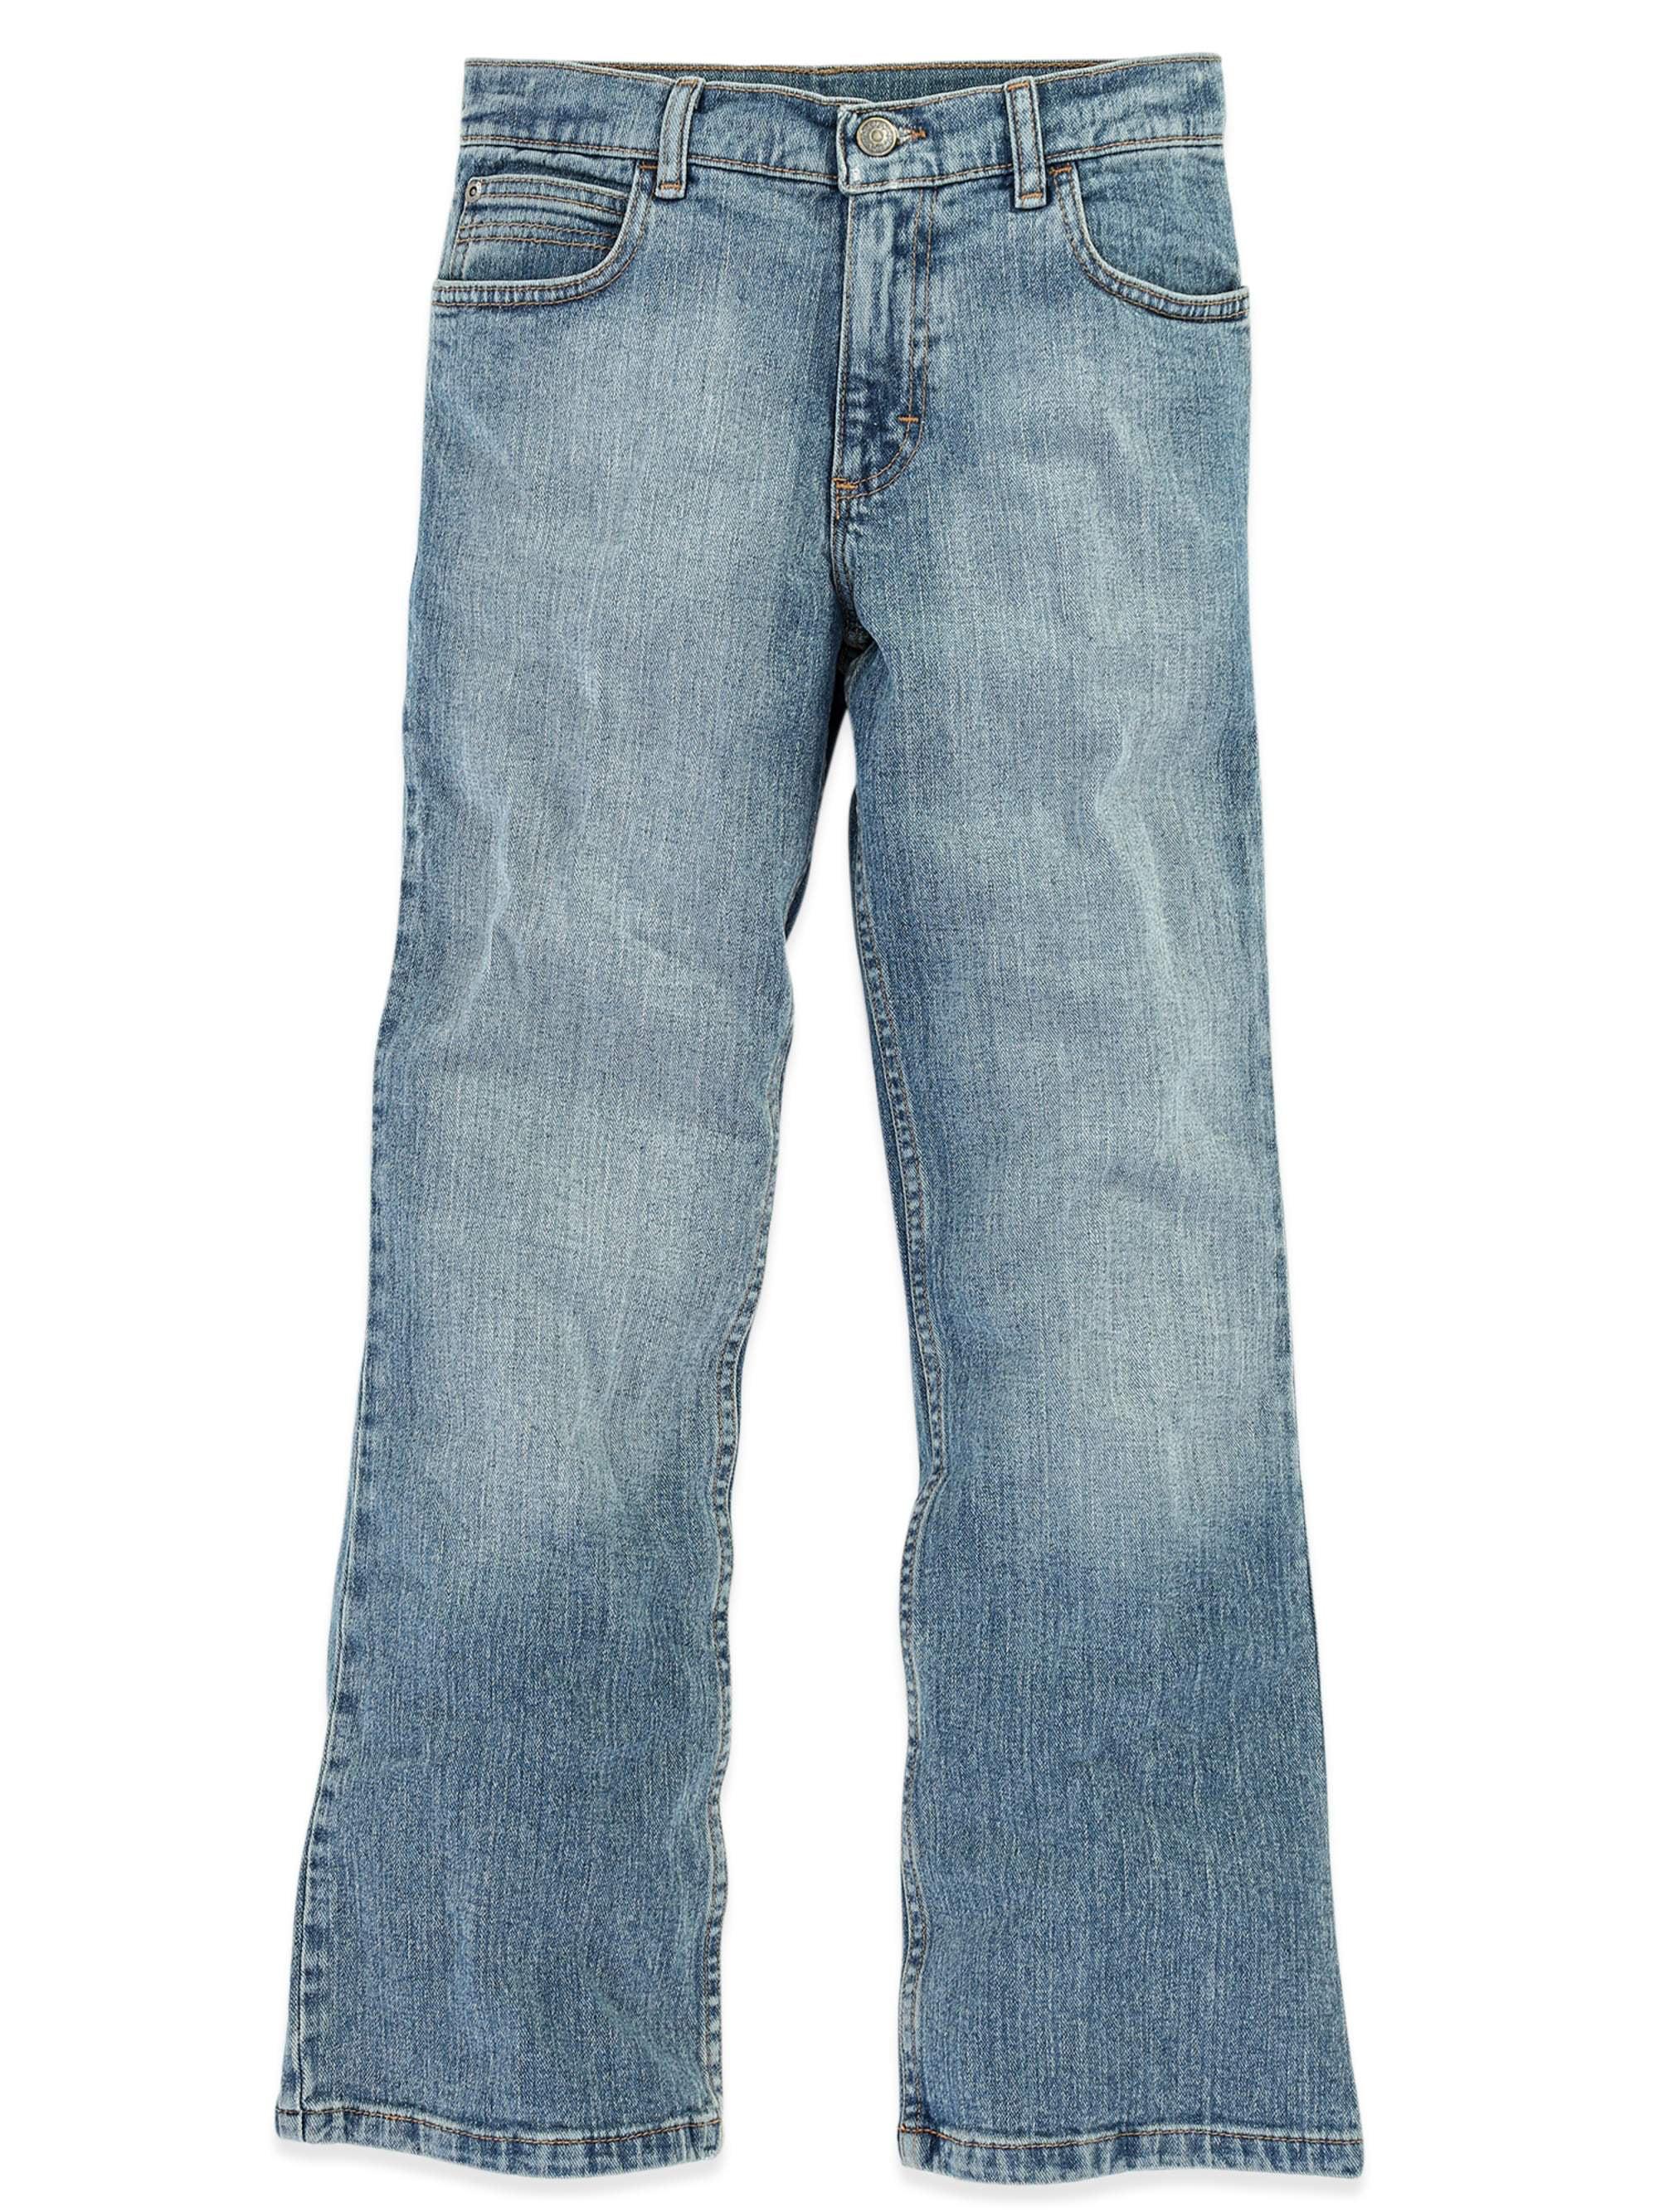 Classic Stretch Boot Fit Jean (Little Boys & Big Boys)